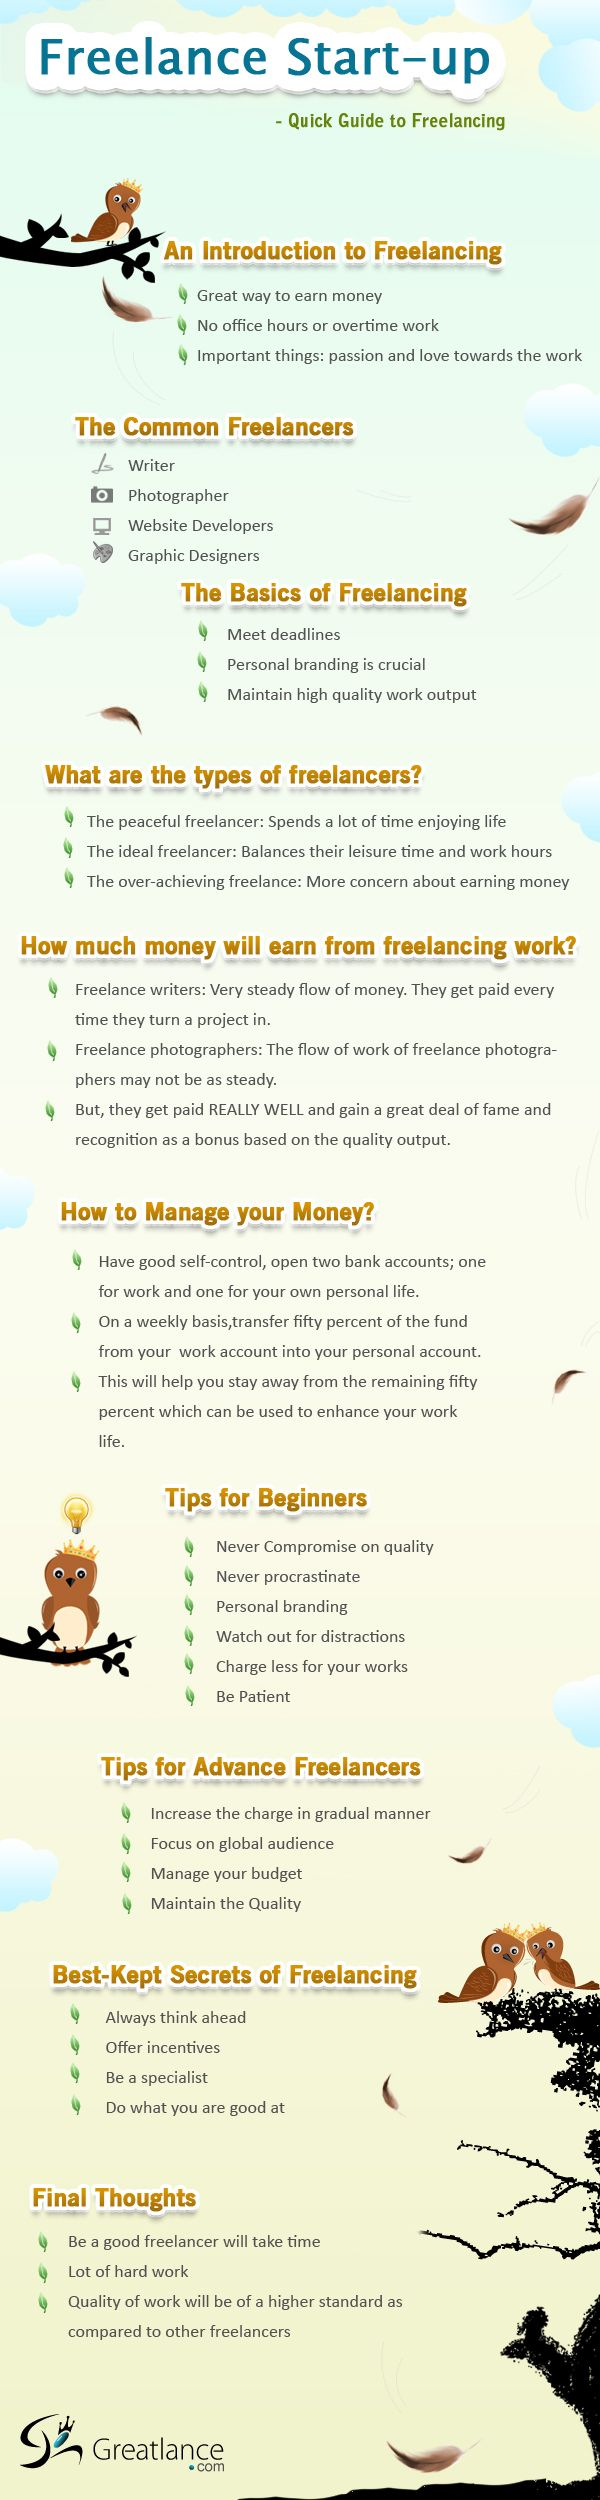 how to start freelance proofreading